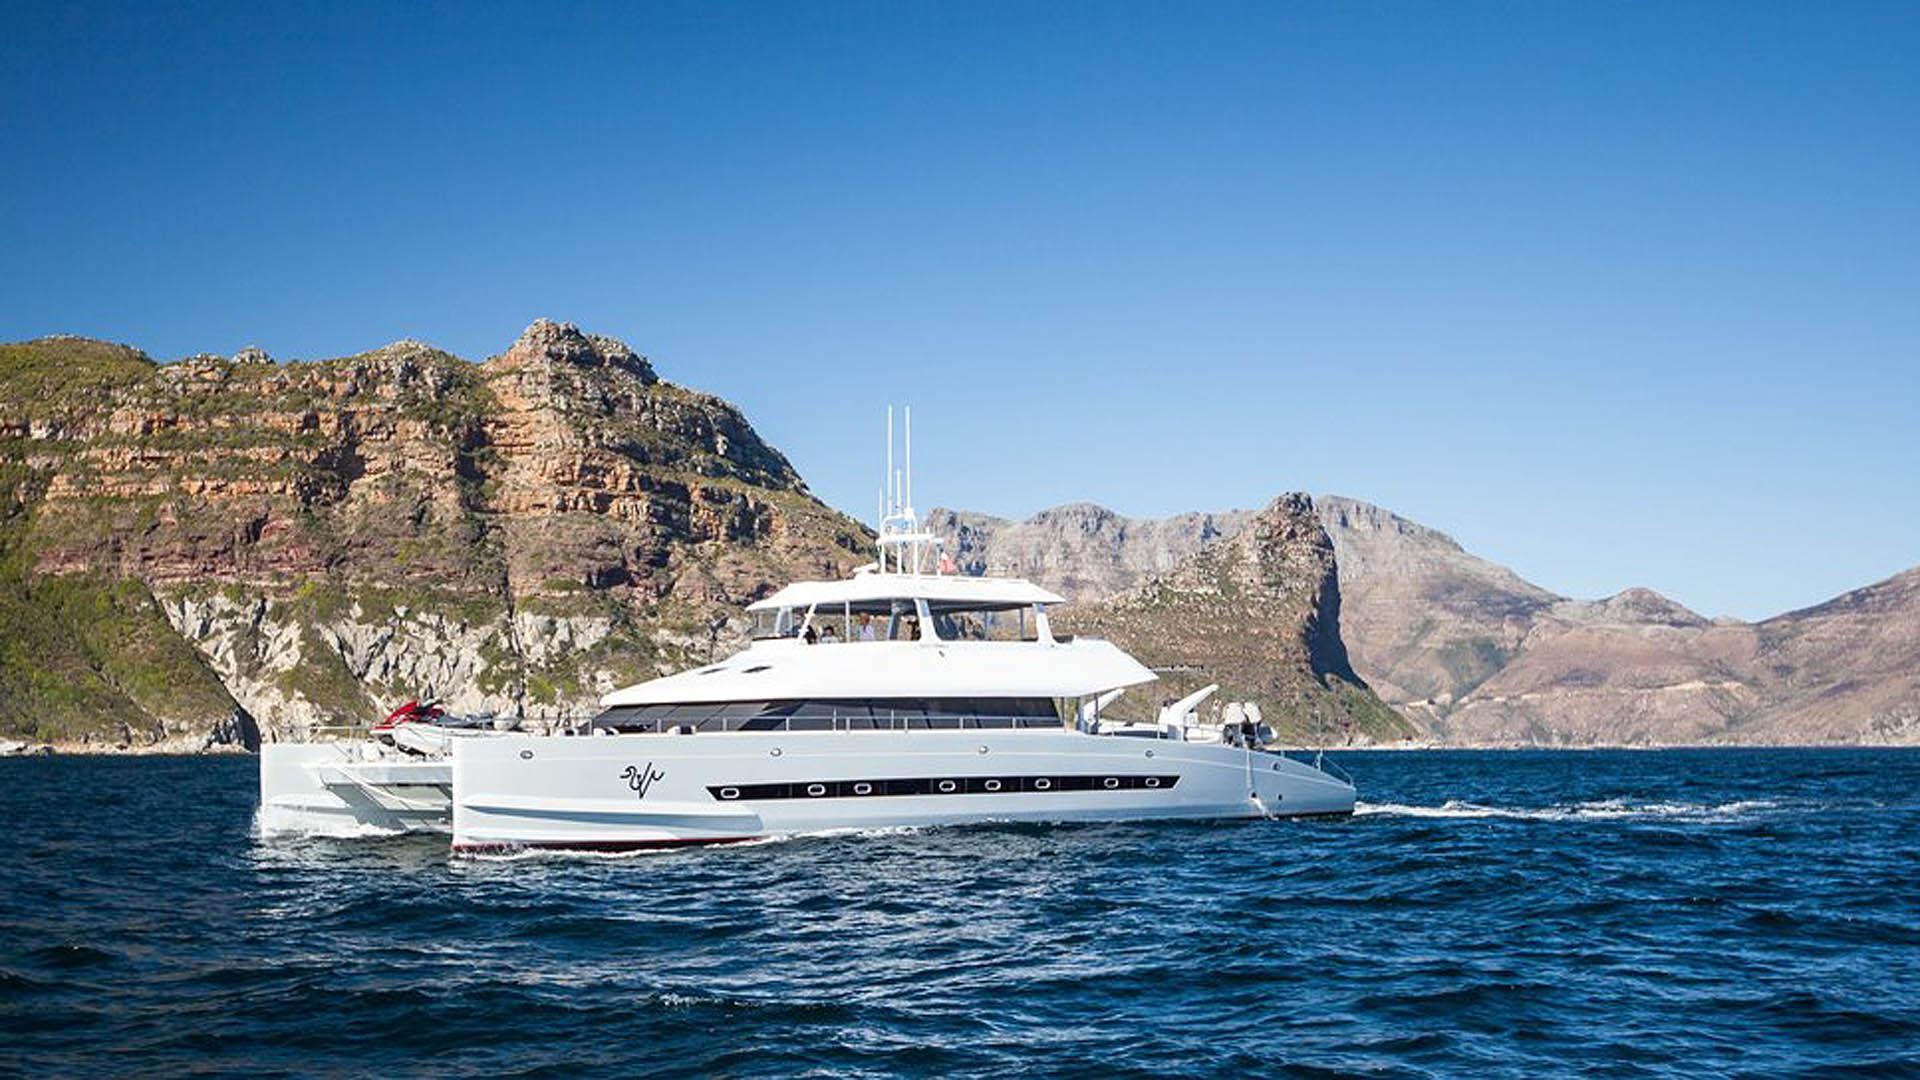 ultra vires catamaran motoryacht two oceans marine 2016 25m running profile